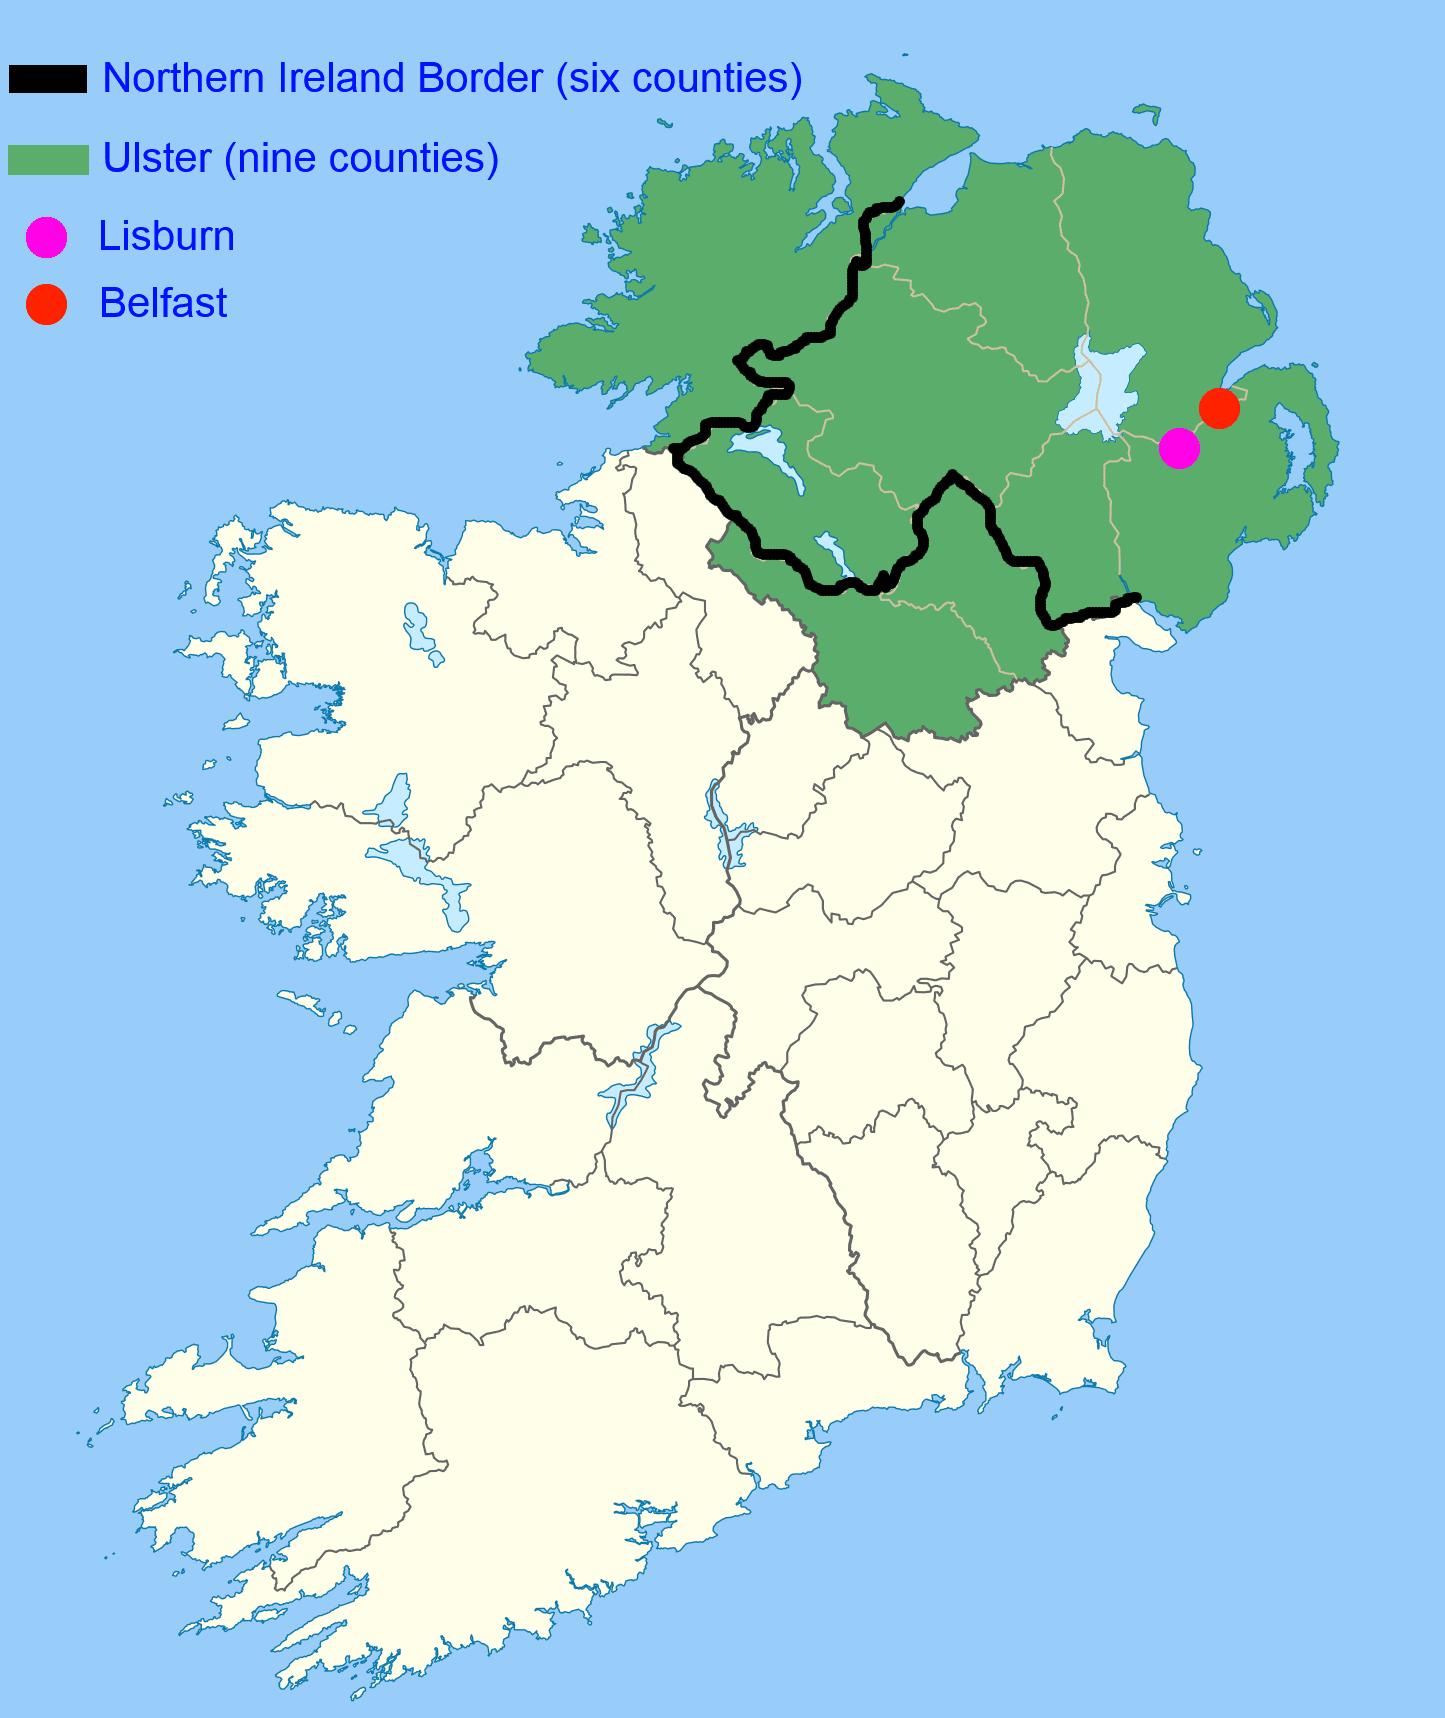 Ulster, Northern Ireland and Lisburn